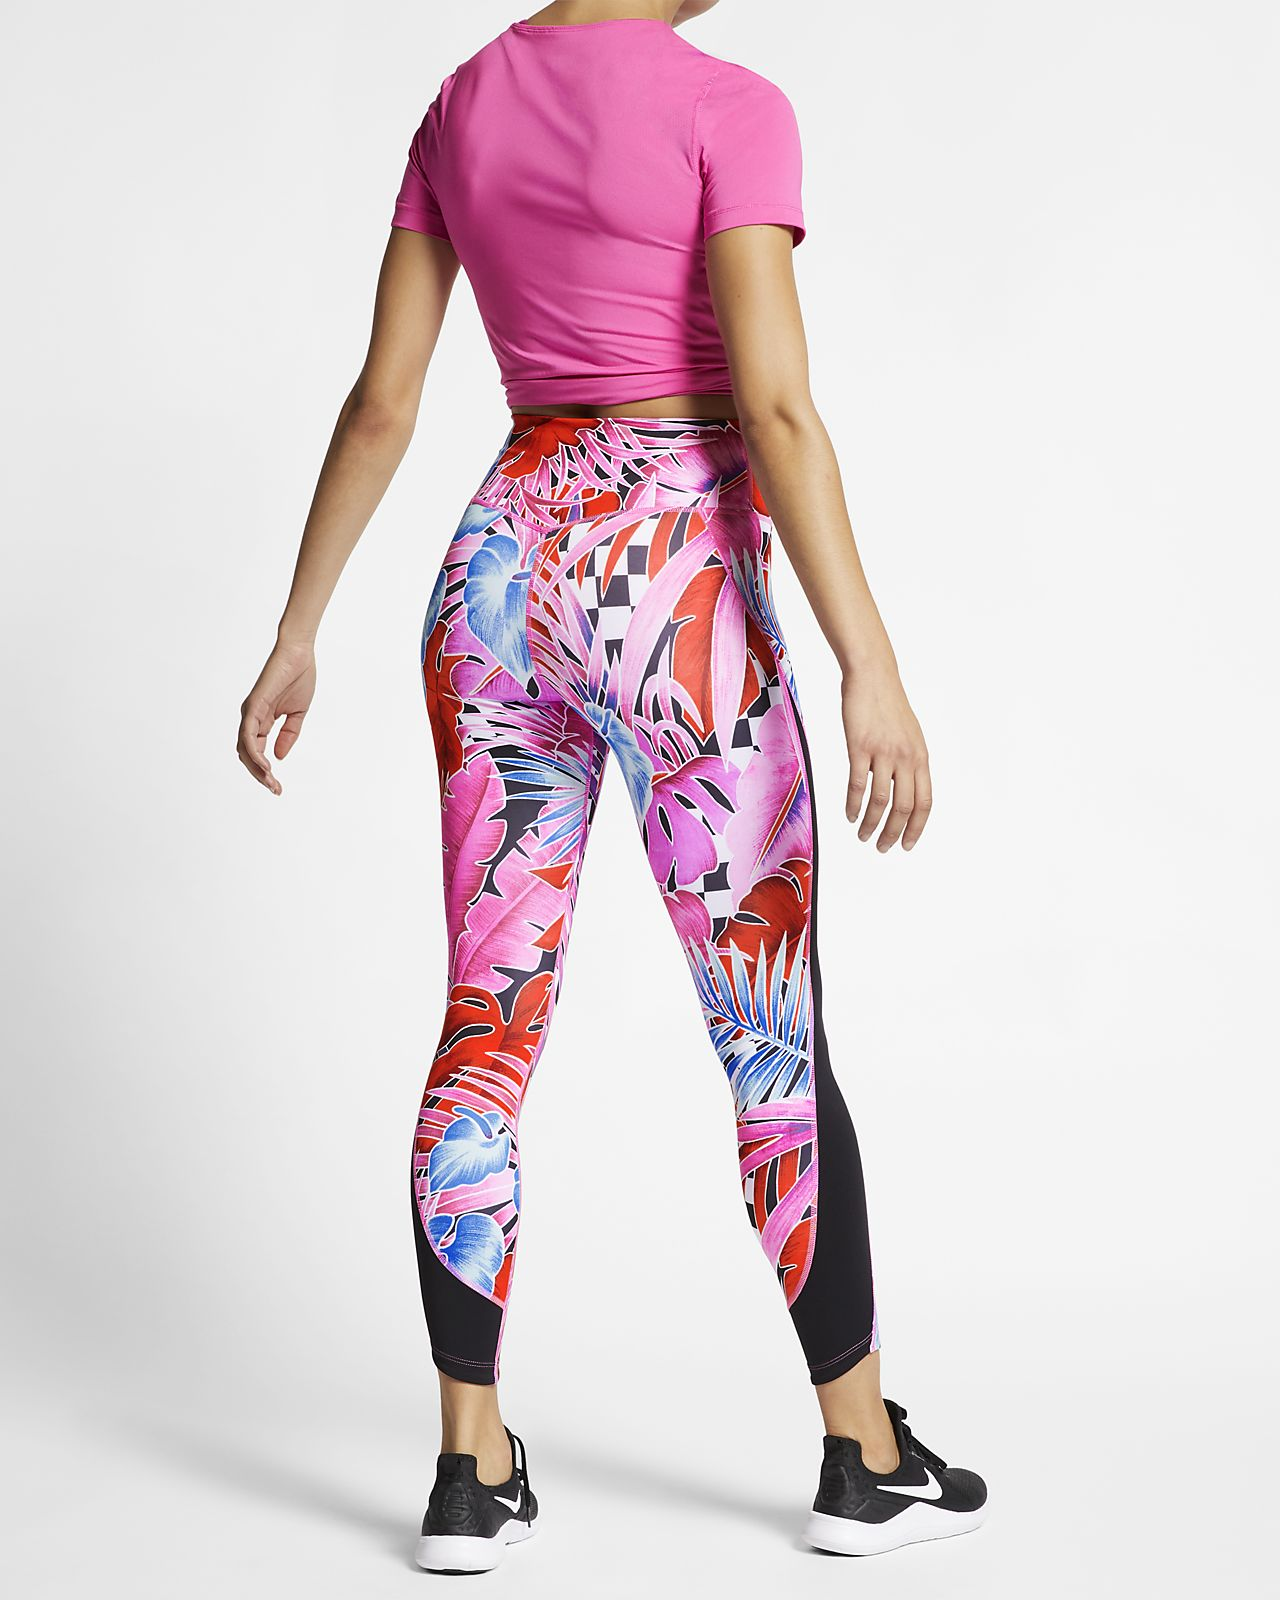 f81c79d19cddfc Nike One Women's Printed 7/8 Training Tights. Nike.com VN